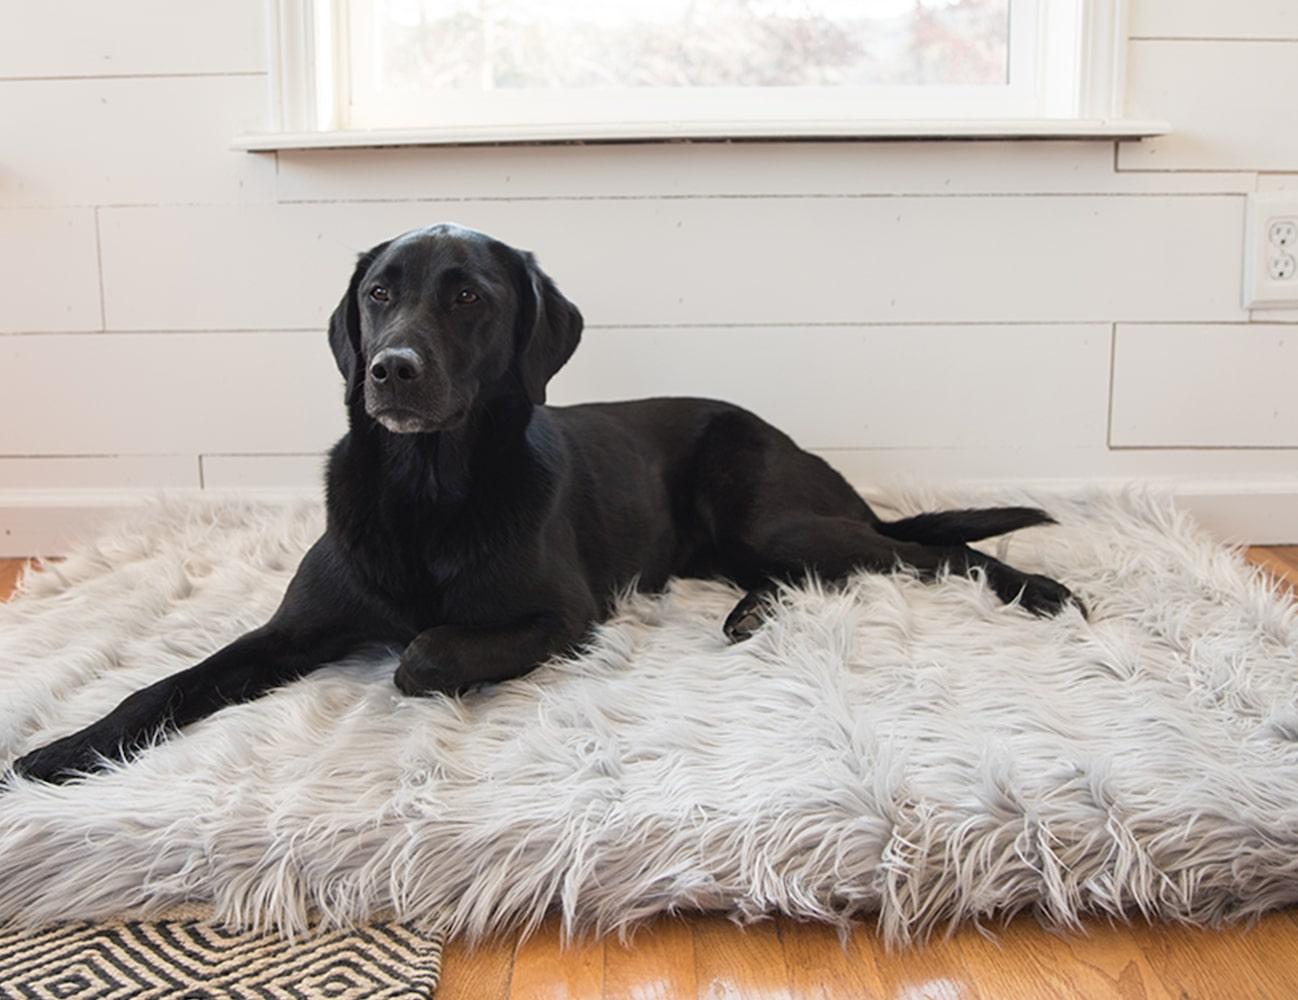 PupRug Faux Fur Orthopedic Dog Bed